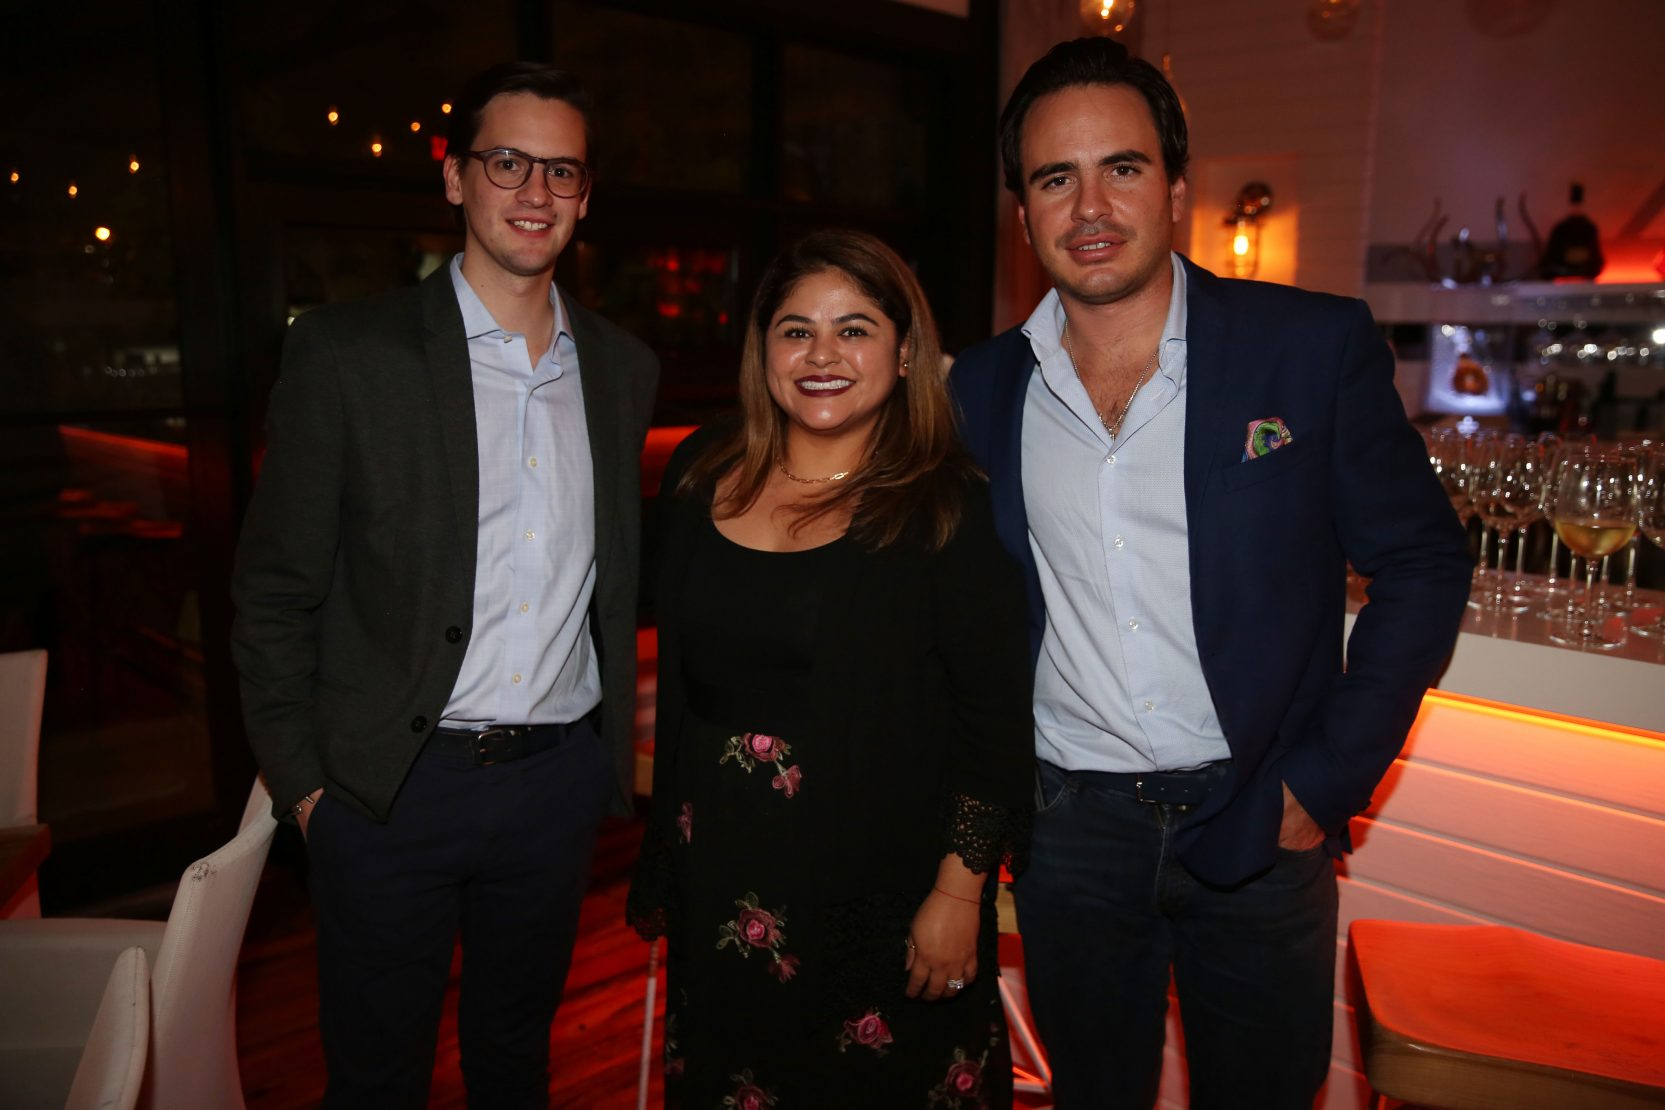 Ricardo Perez, Miluska Quispe and Eduardo Perez